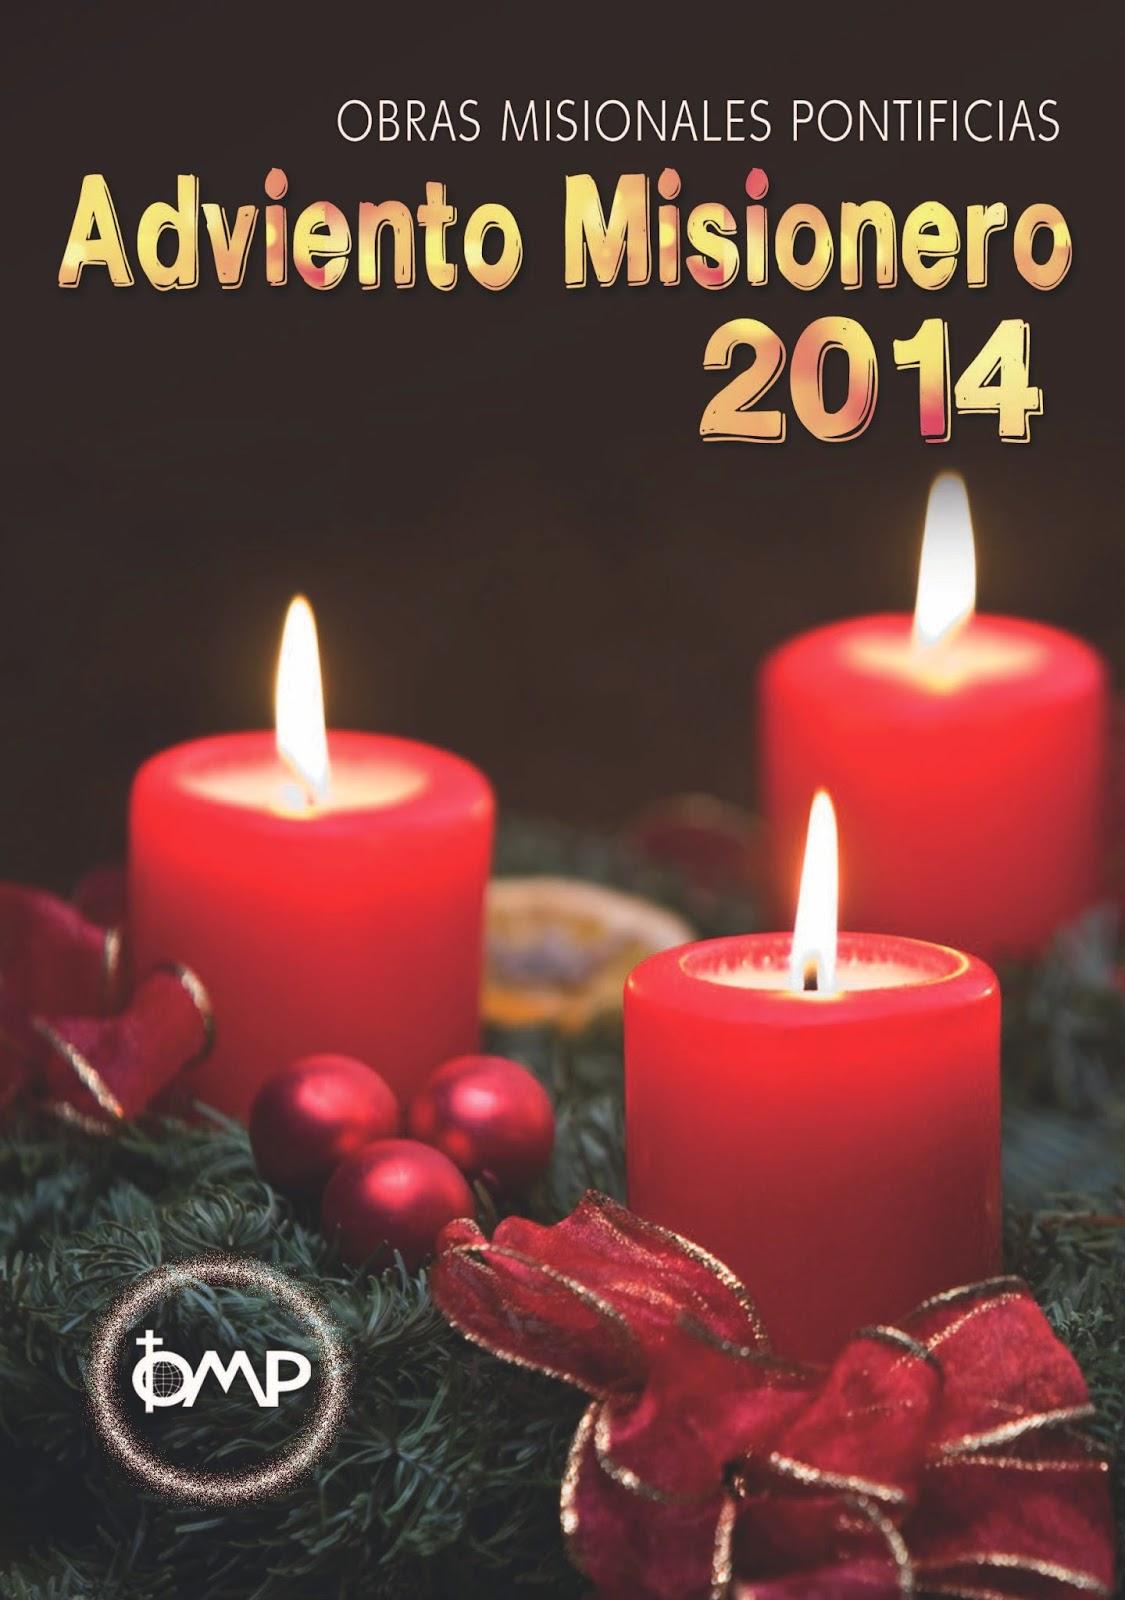 Adviento_Misionero_2014